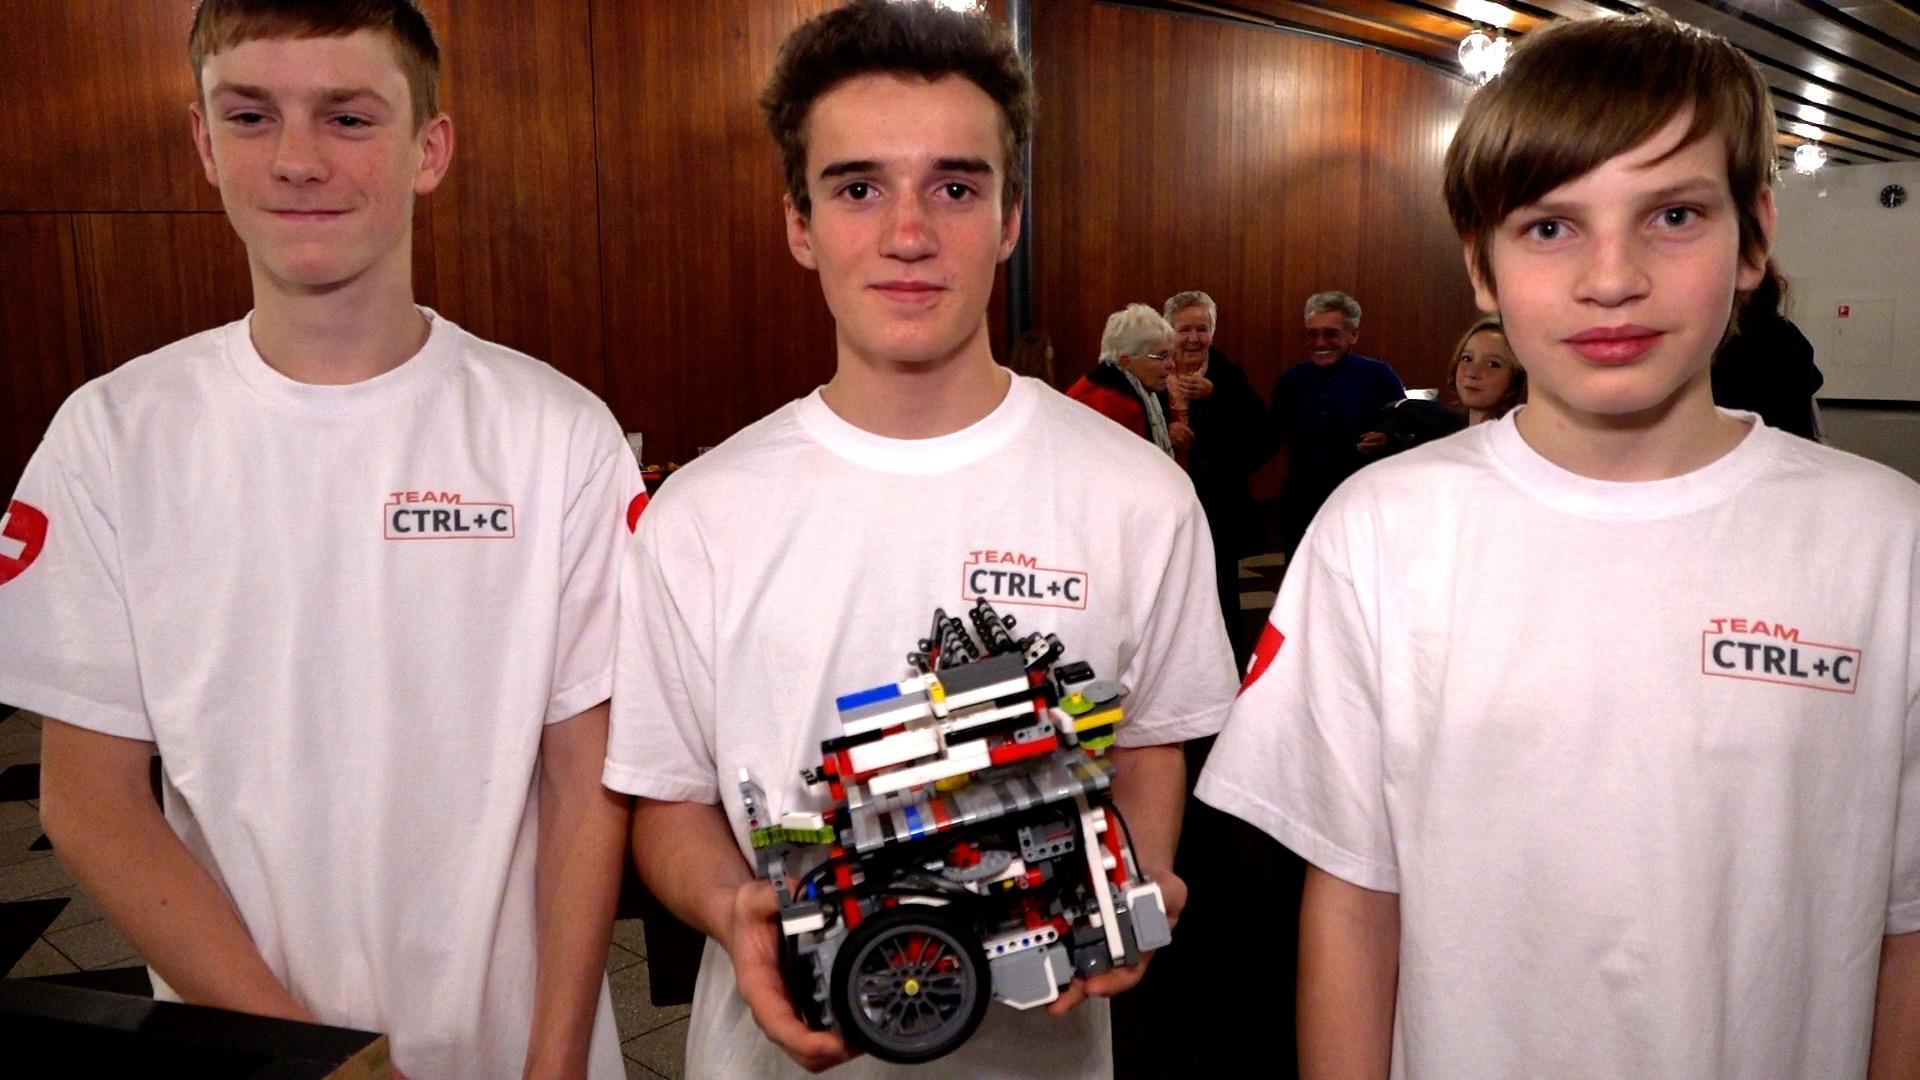 Zürcher Schüler Beim Roboter Weltfinale In Indien ...